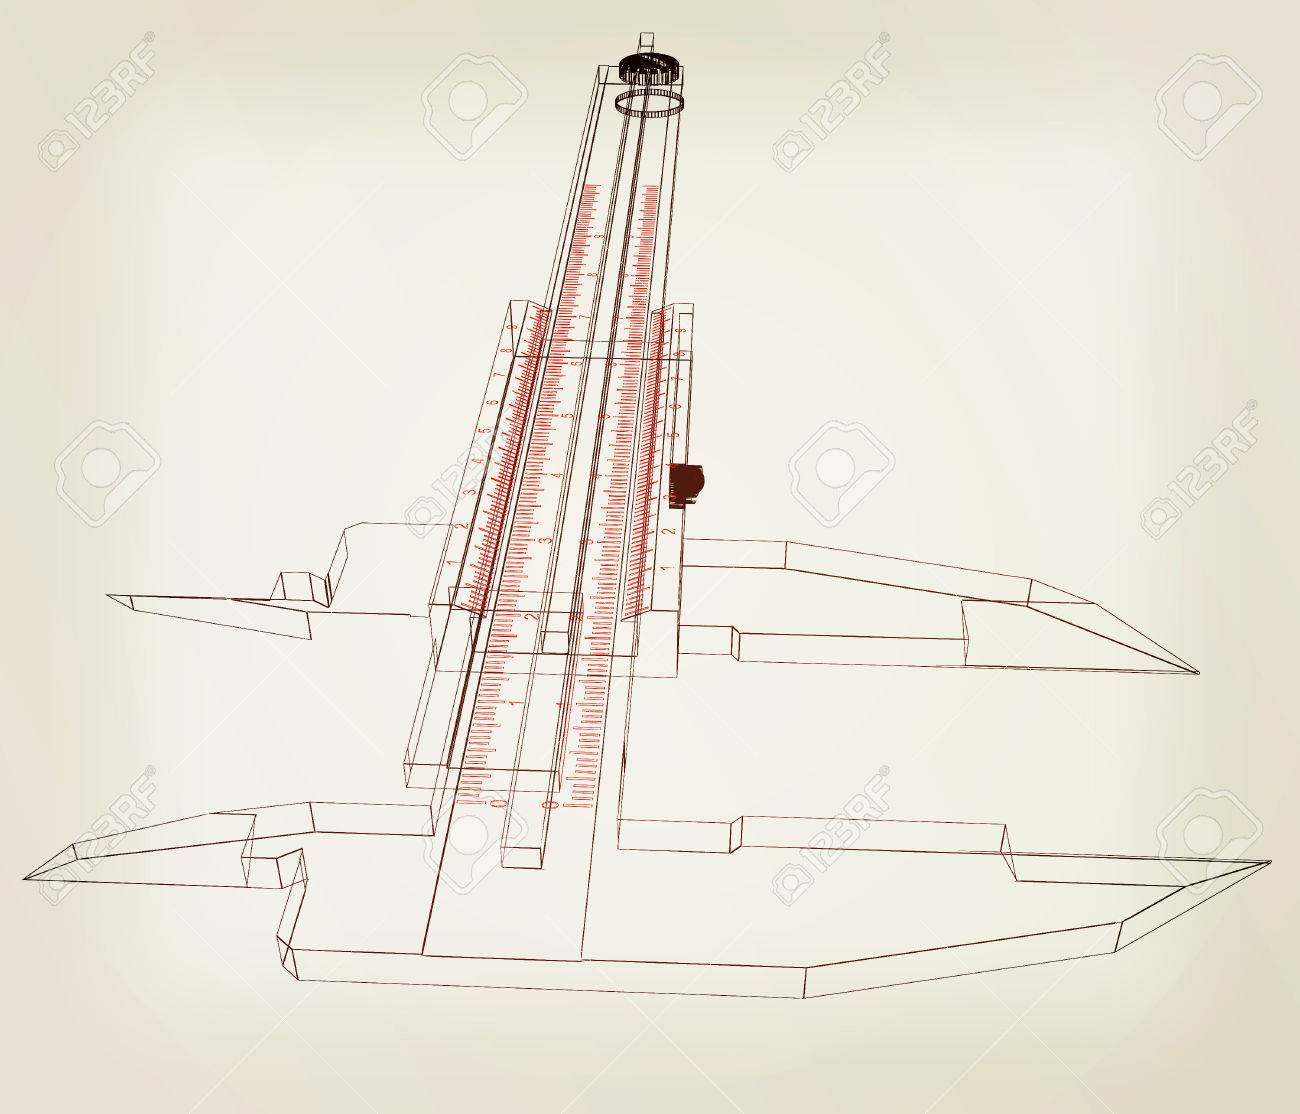 hight resolution of vernier caliper 3d illustration vintage style stock illustration 60854050